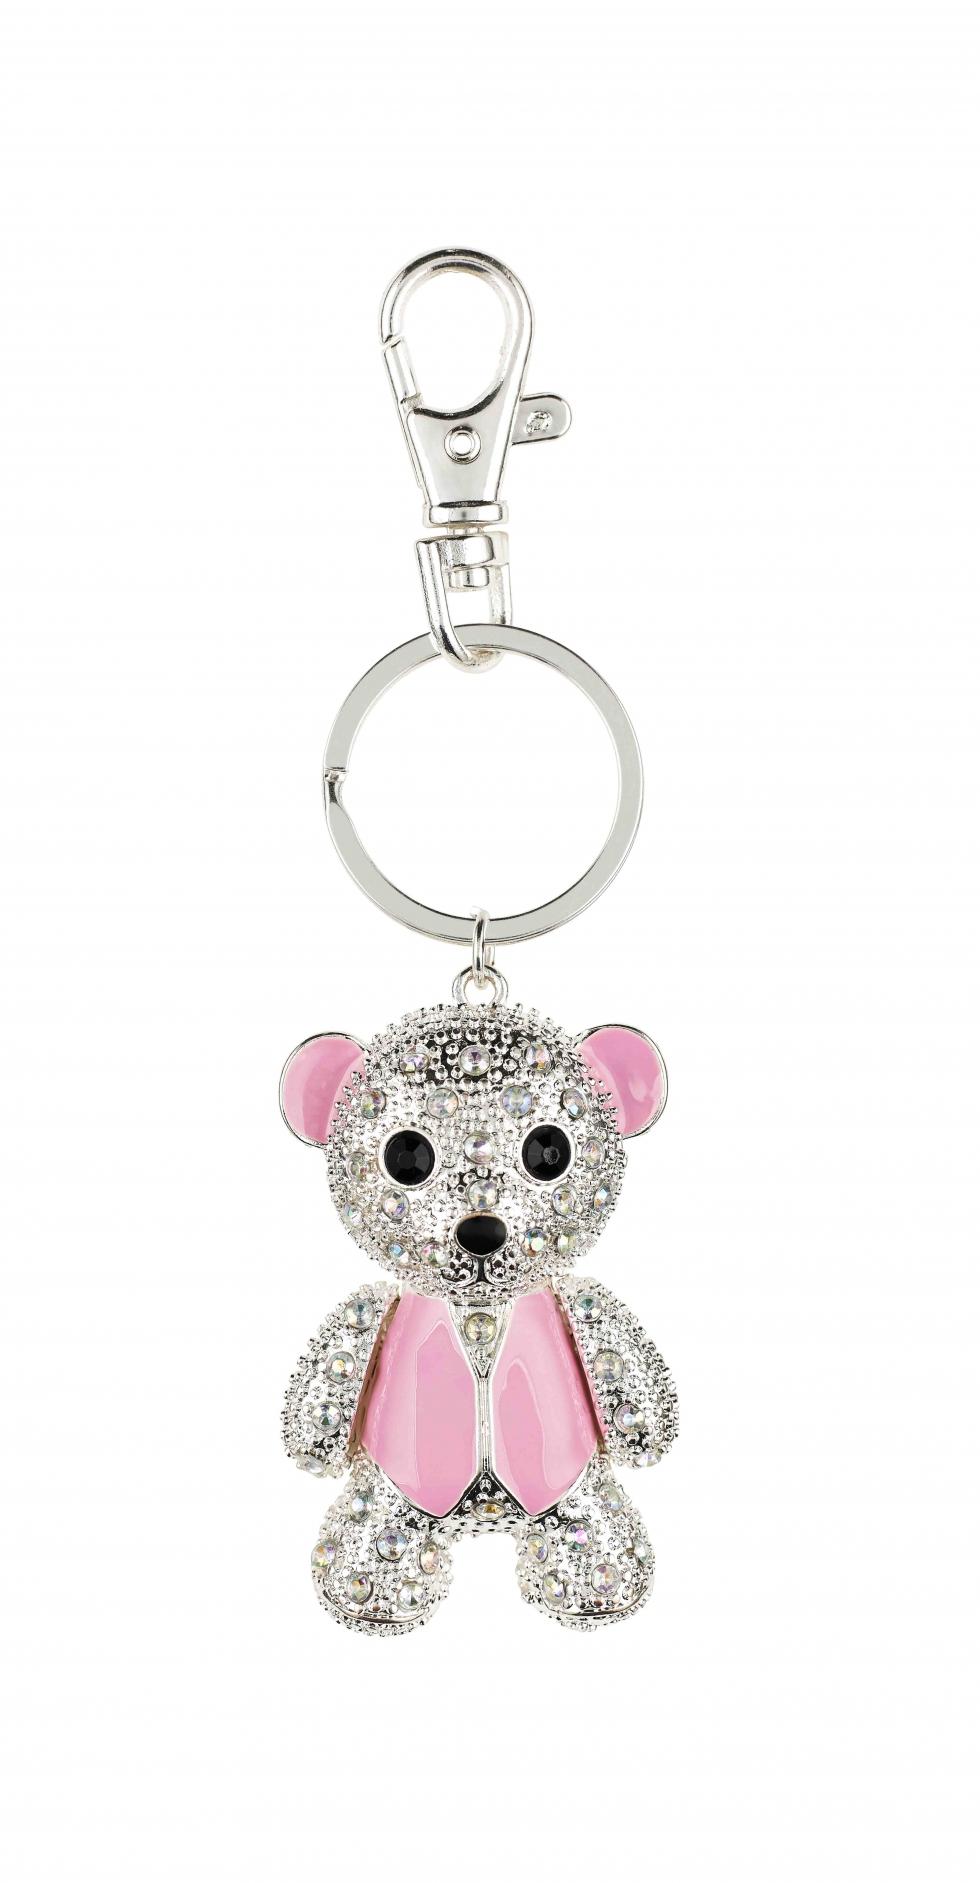 Asda Tickled Pink teddy keyring